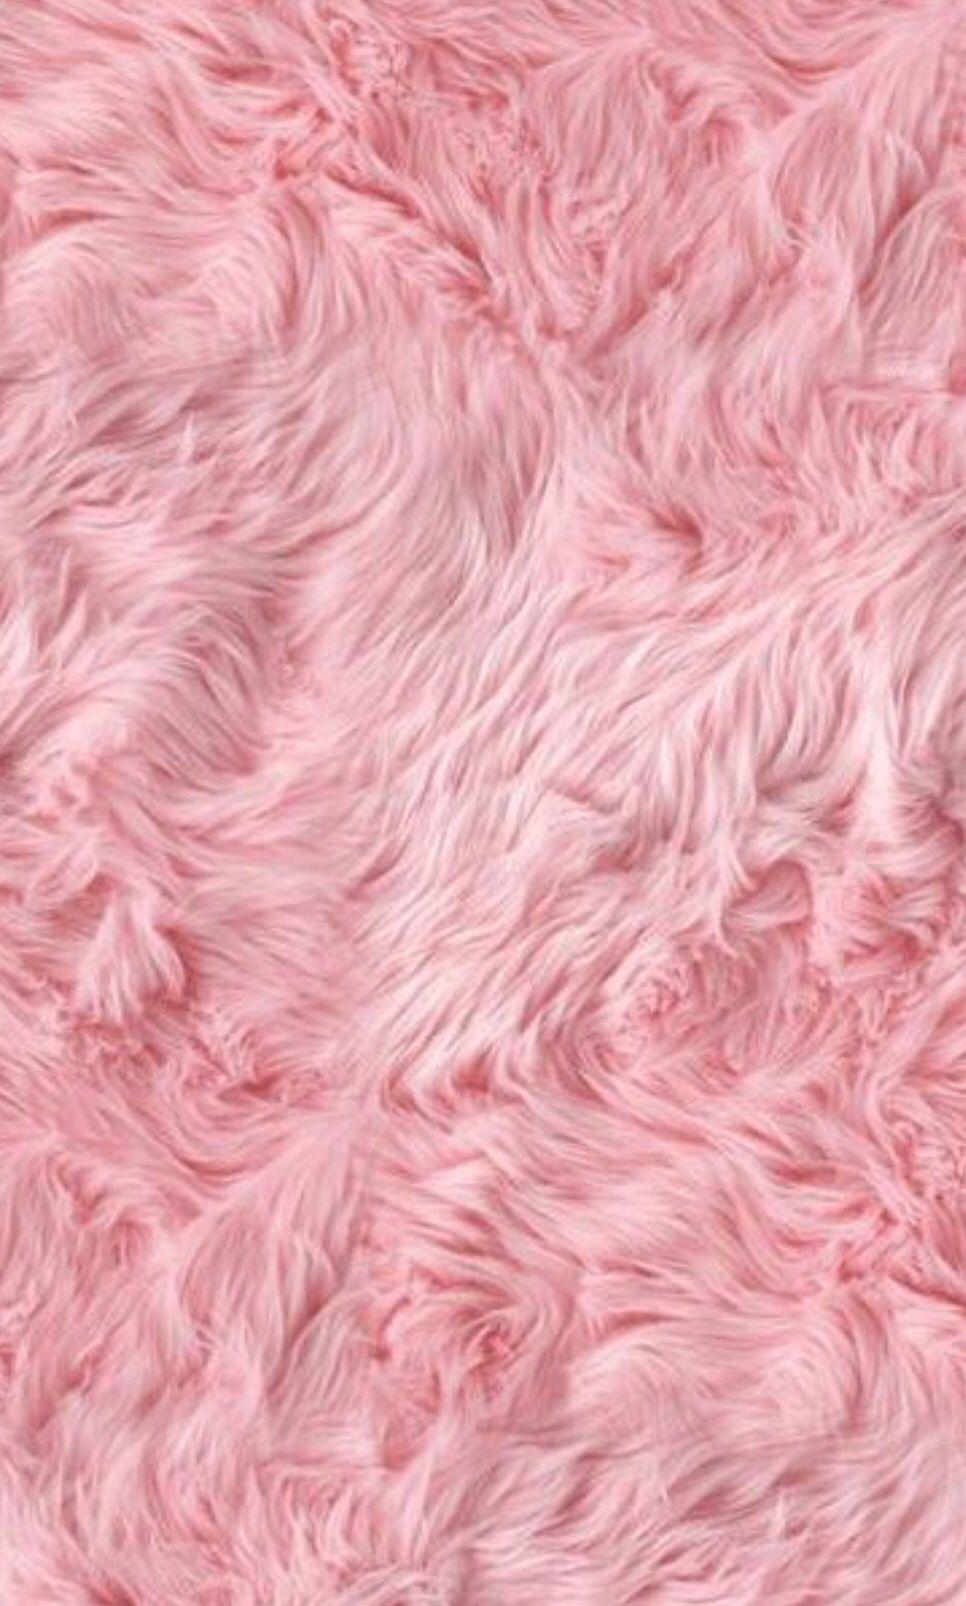 Pink Fluffy Wallpaper Backgrounds Pinterest Fondos HD Wallpapers Download Free Images Wallpaper [1000image.com]